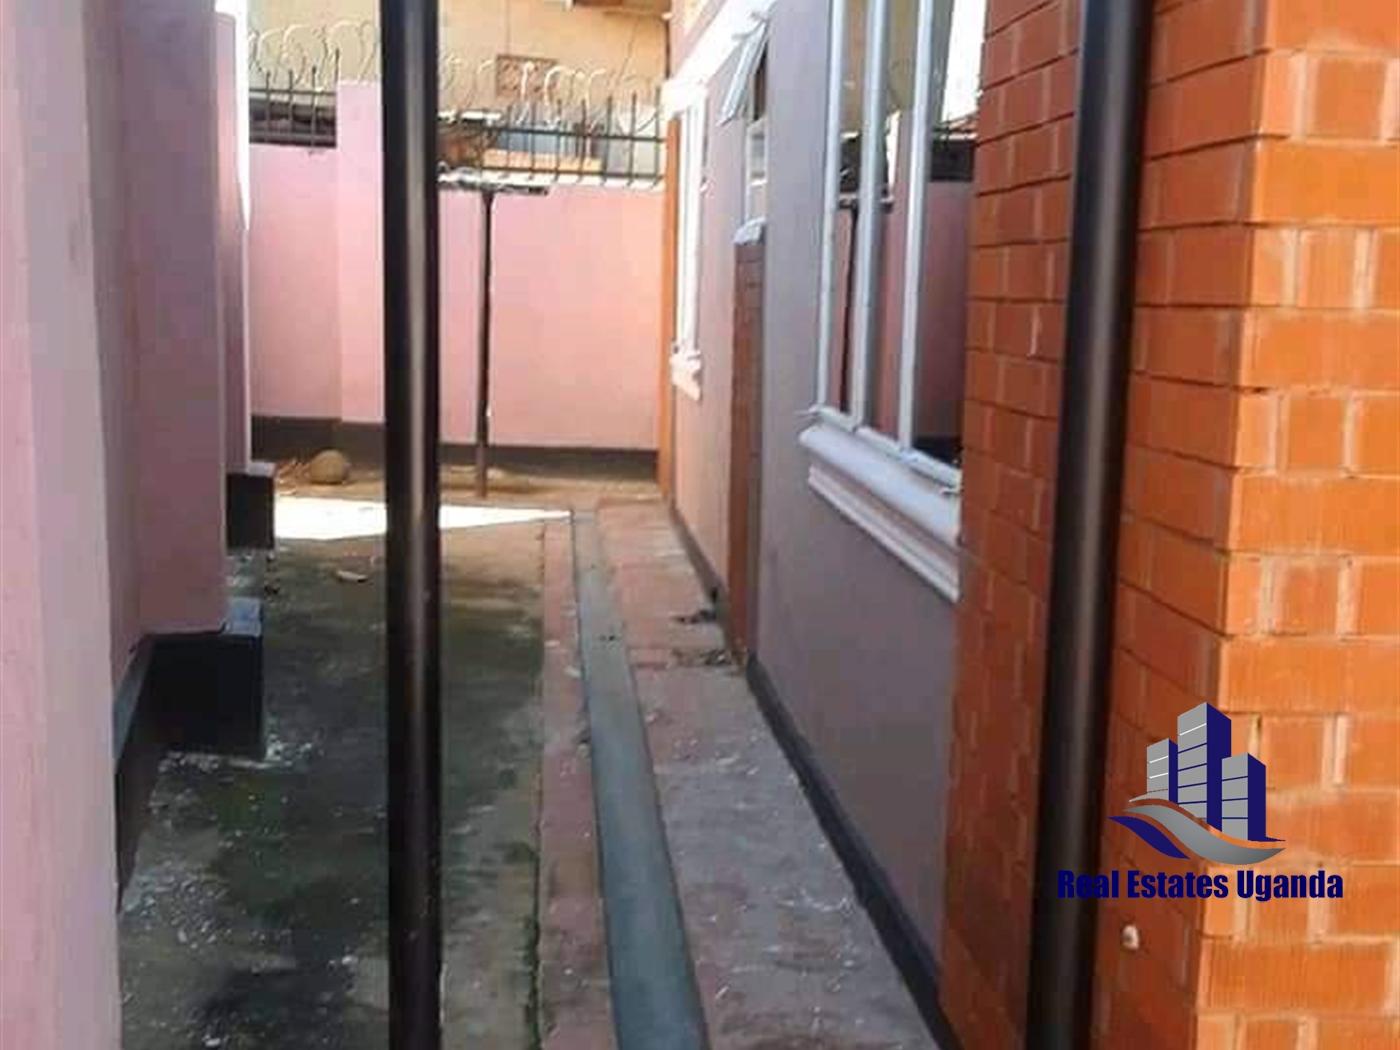 Rental units for rent in Najjeera Kampala